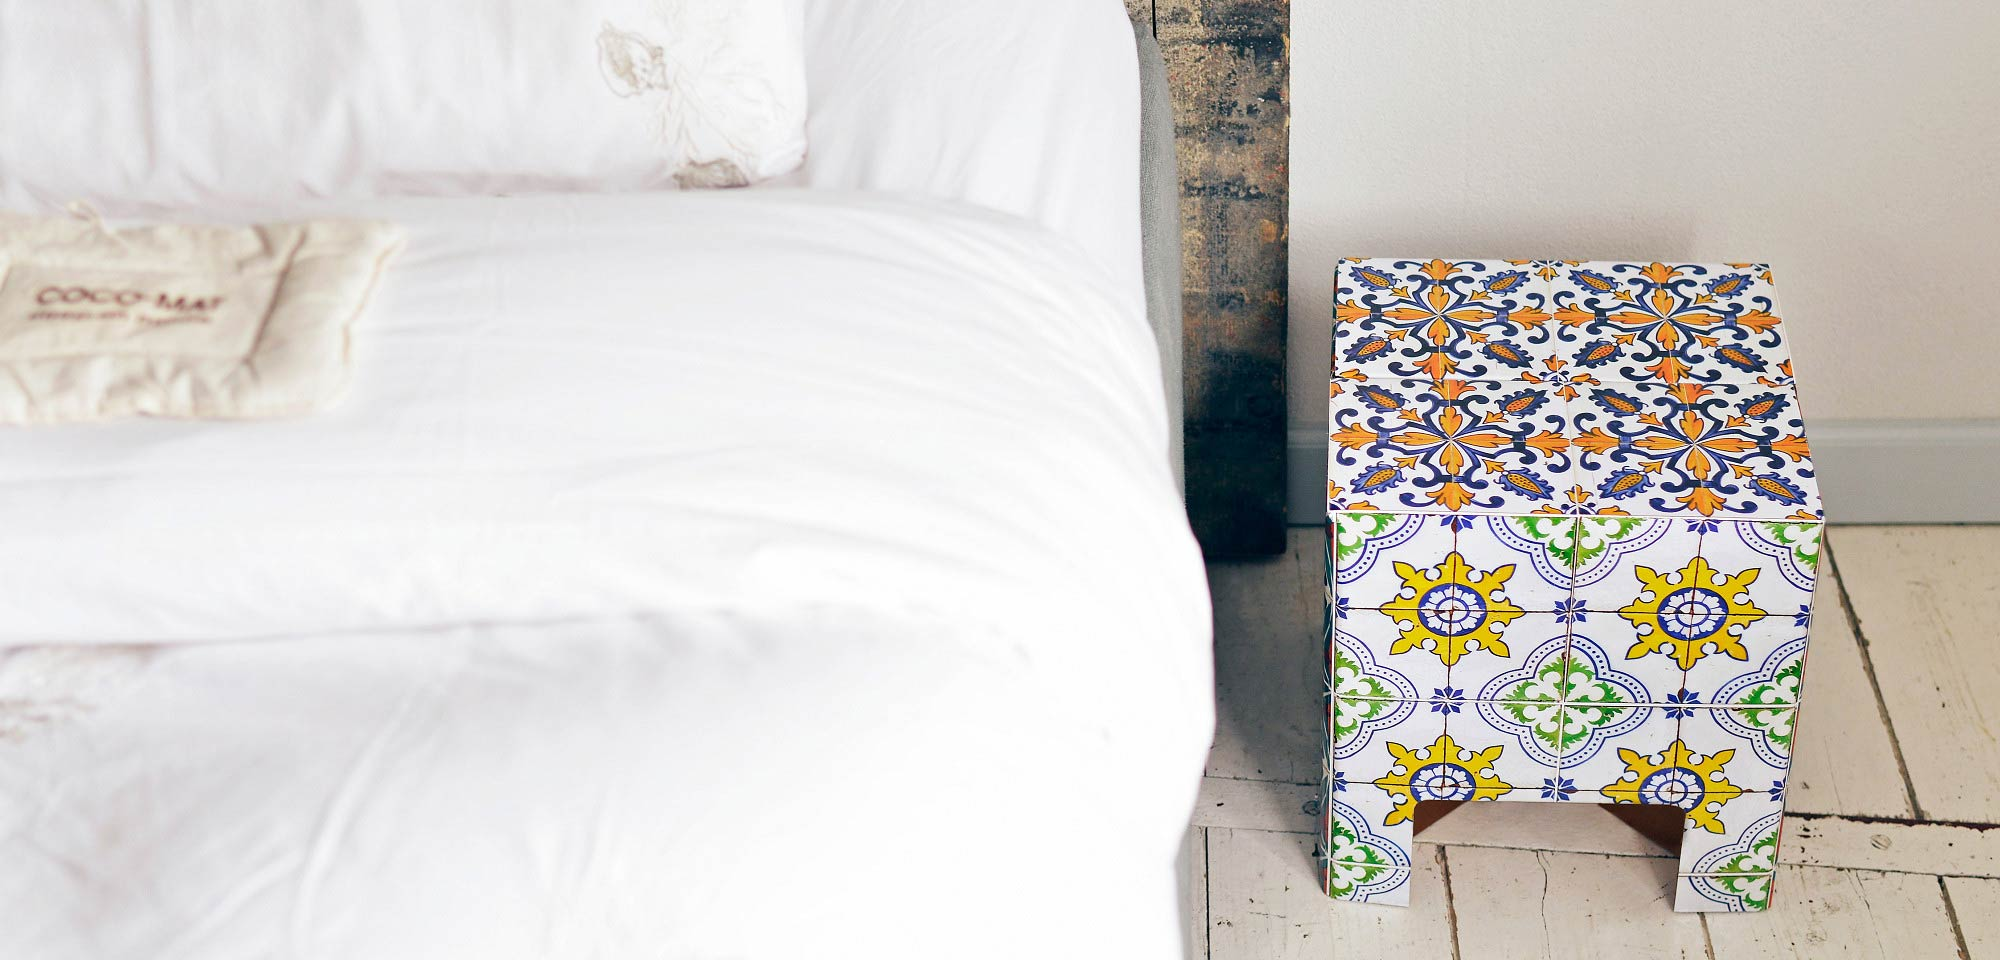 Dutch Design Chair Portuguese Tiles